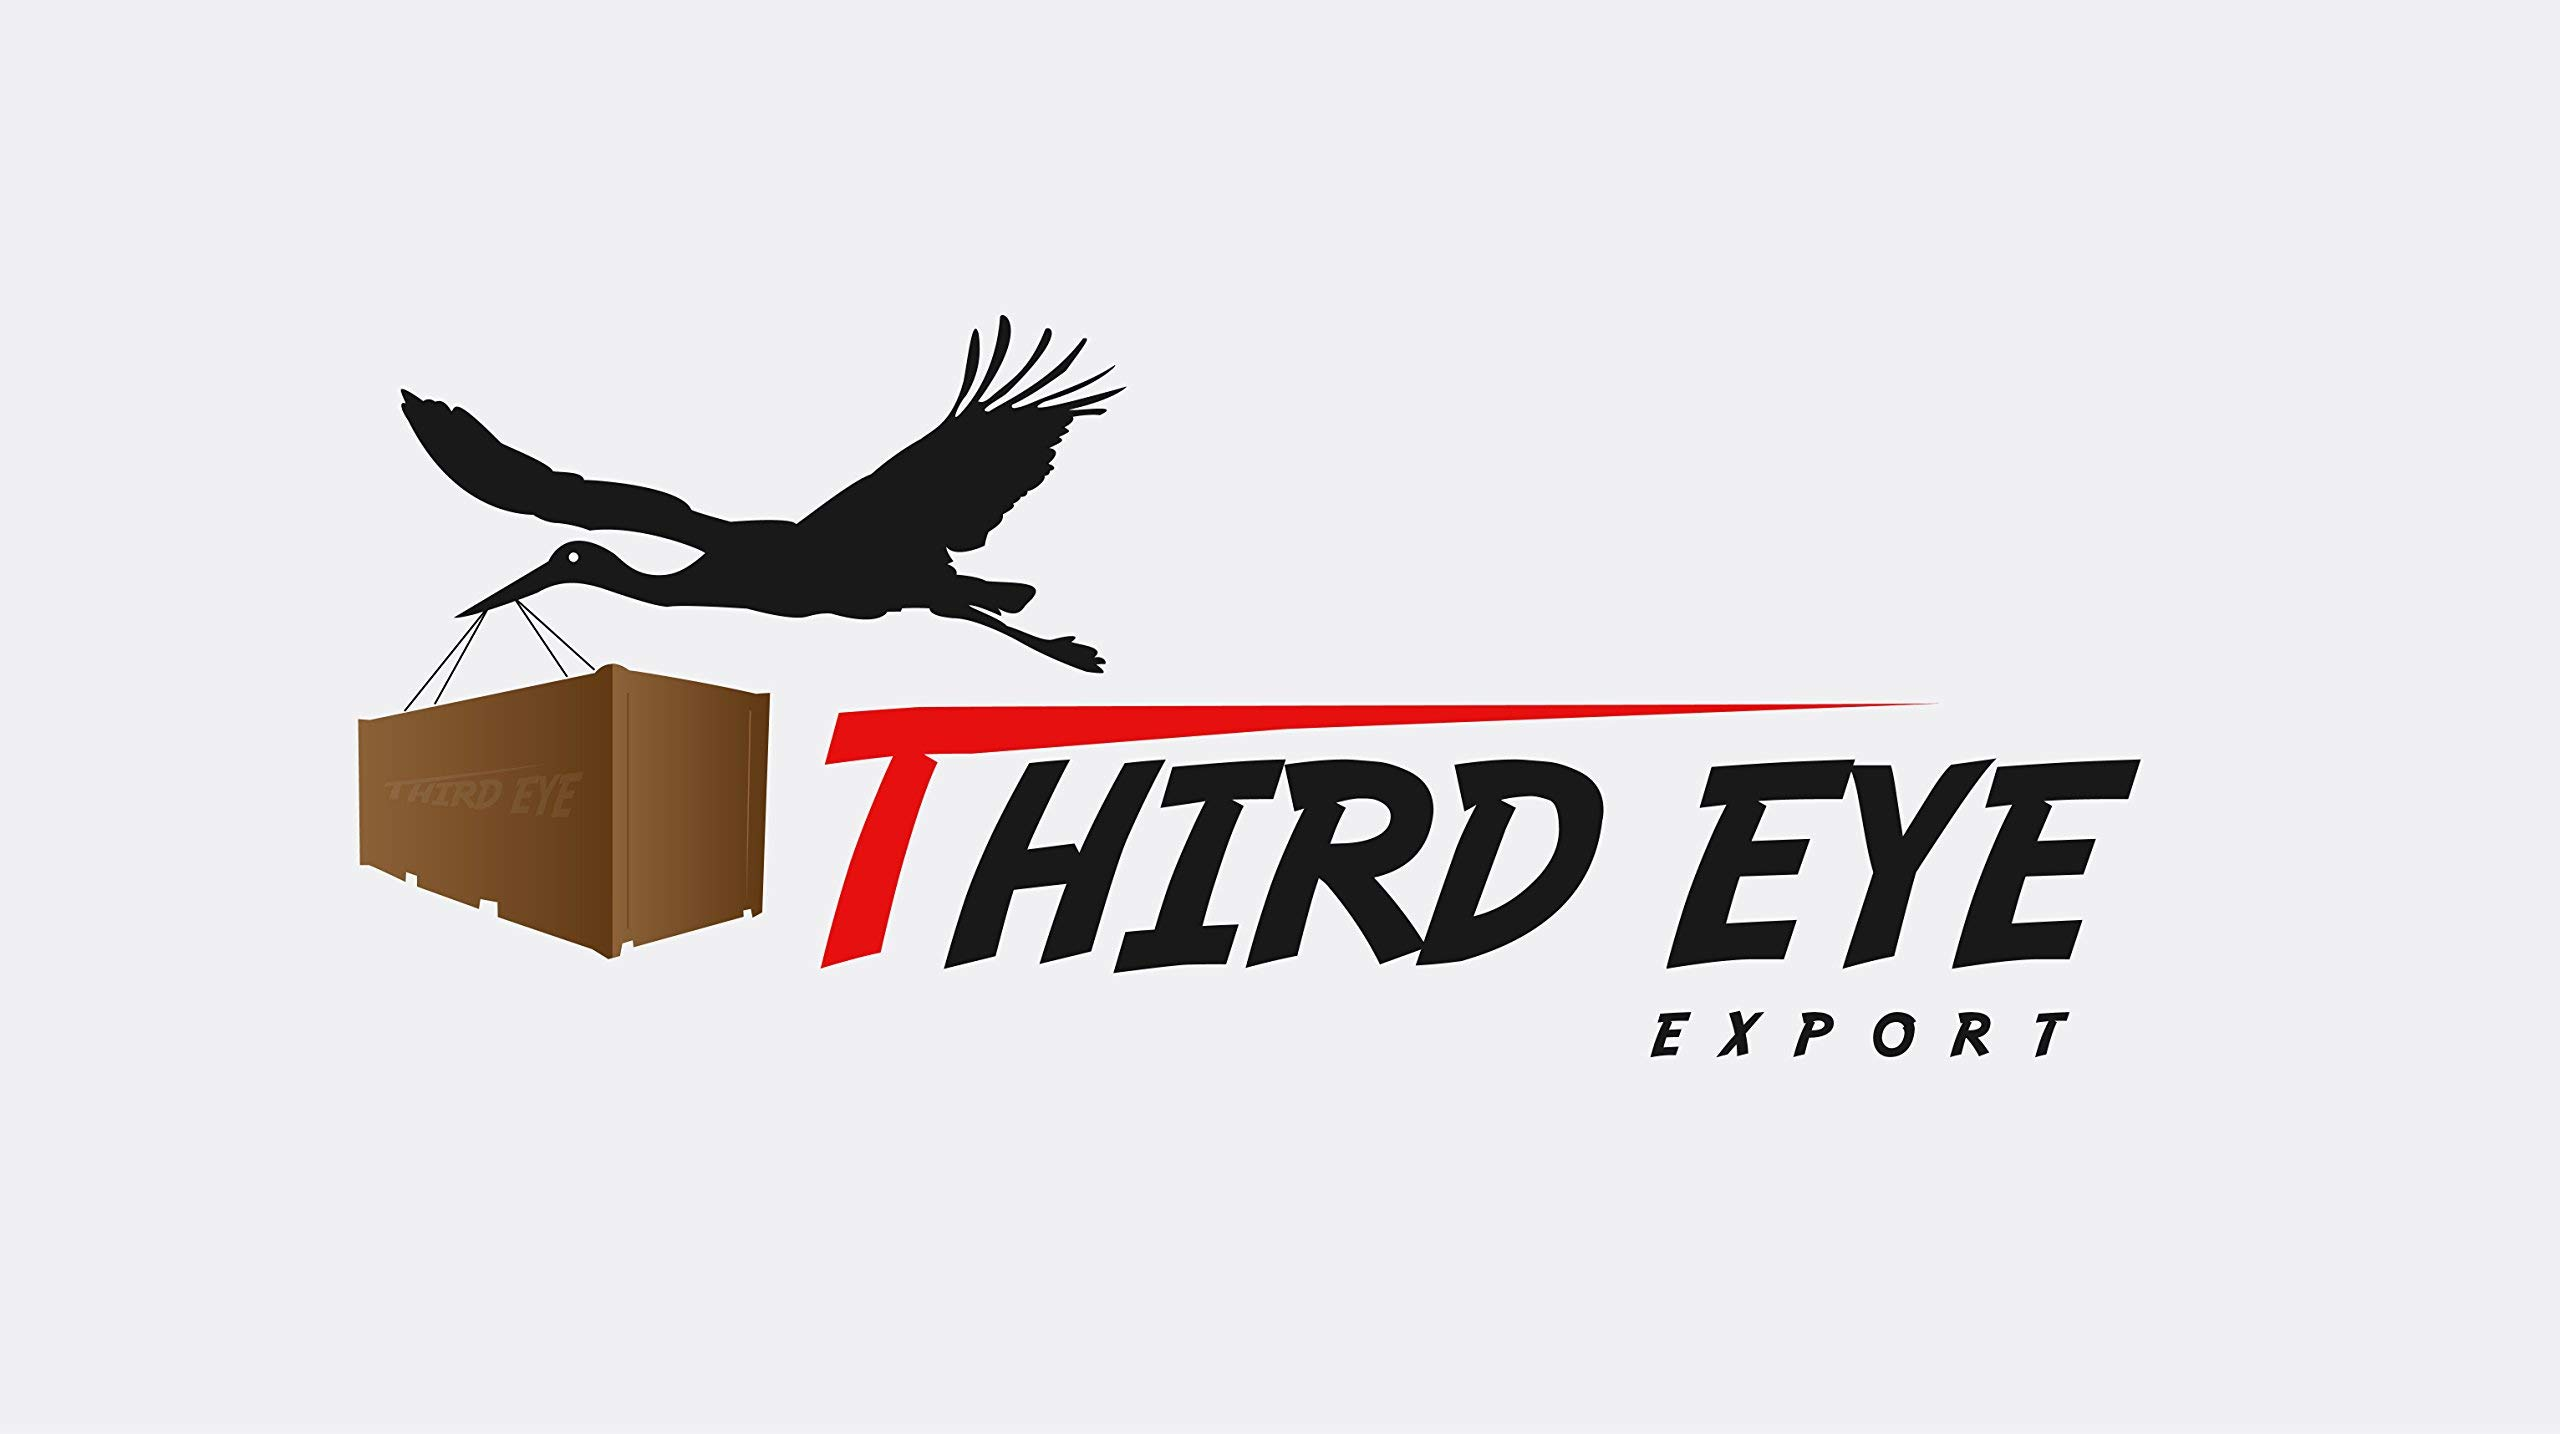 Third Eye Export 32 Inches Diameter Round Meditation Seating Ottoman Decorative Sham Stuffer Round Floor Pillow Insert by Third Eye Export (Image #3)